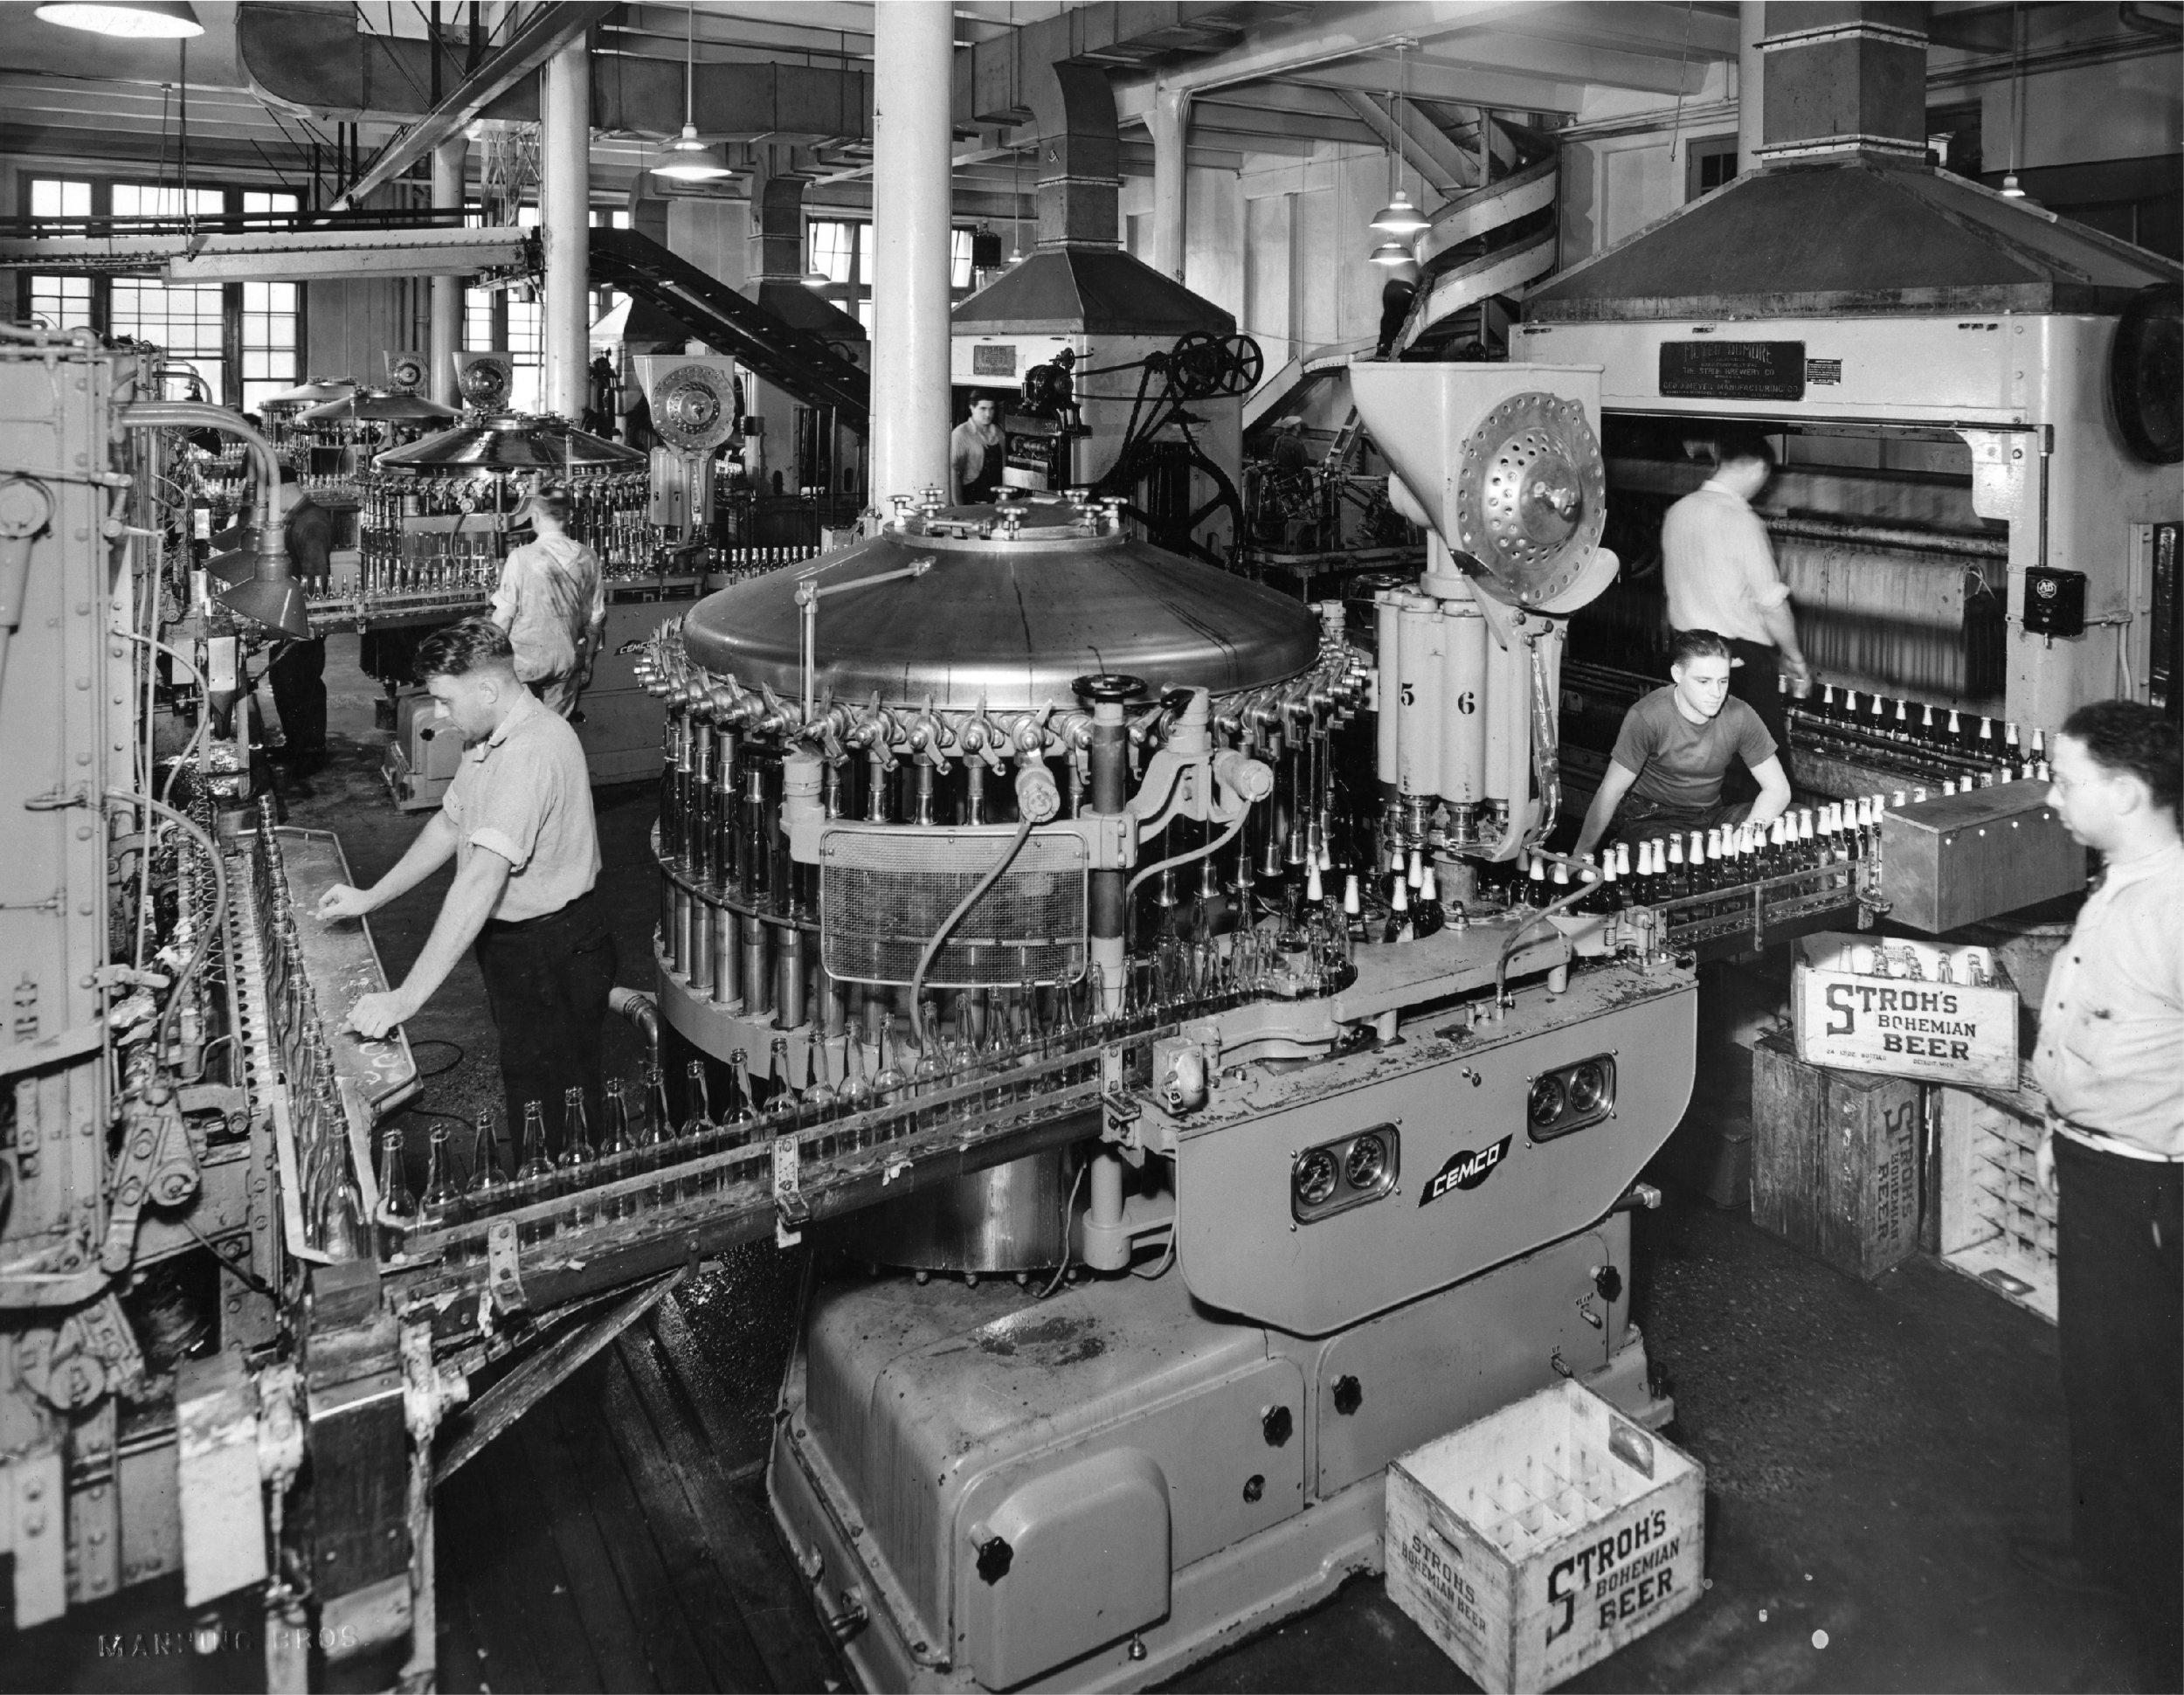 132125 Stroh Brewery September 12 1938 small.jpg